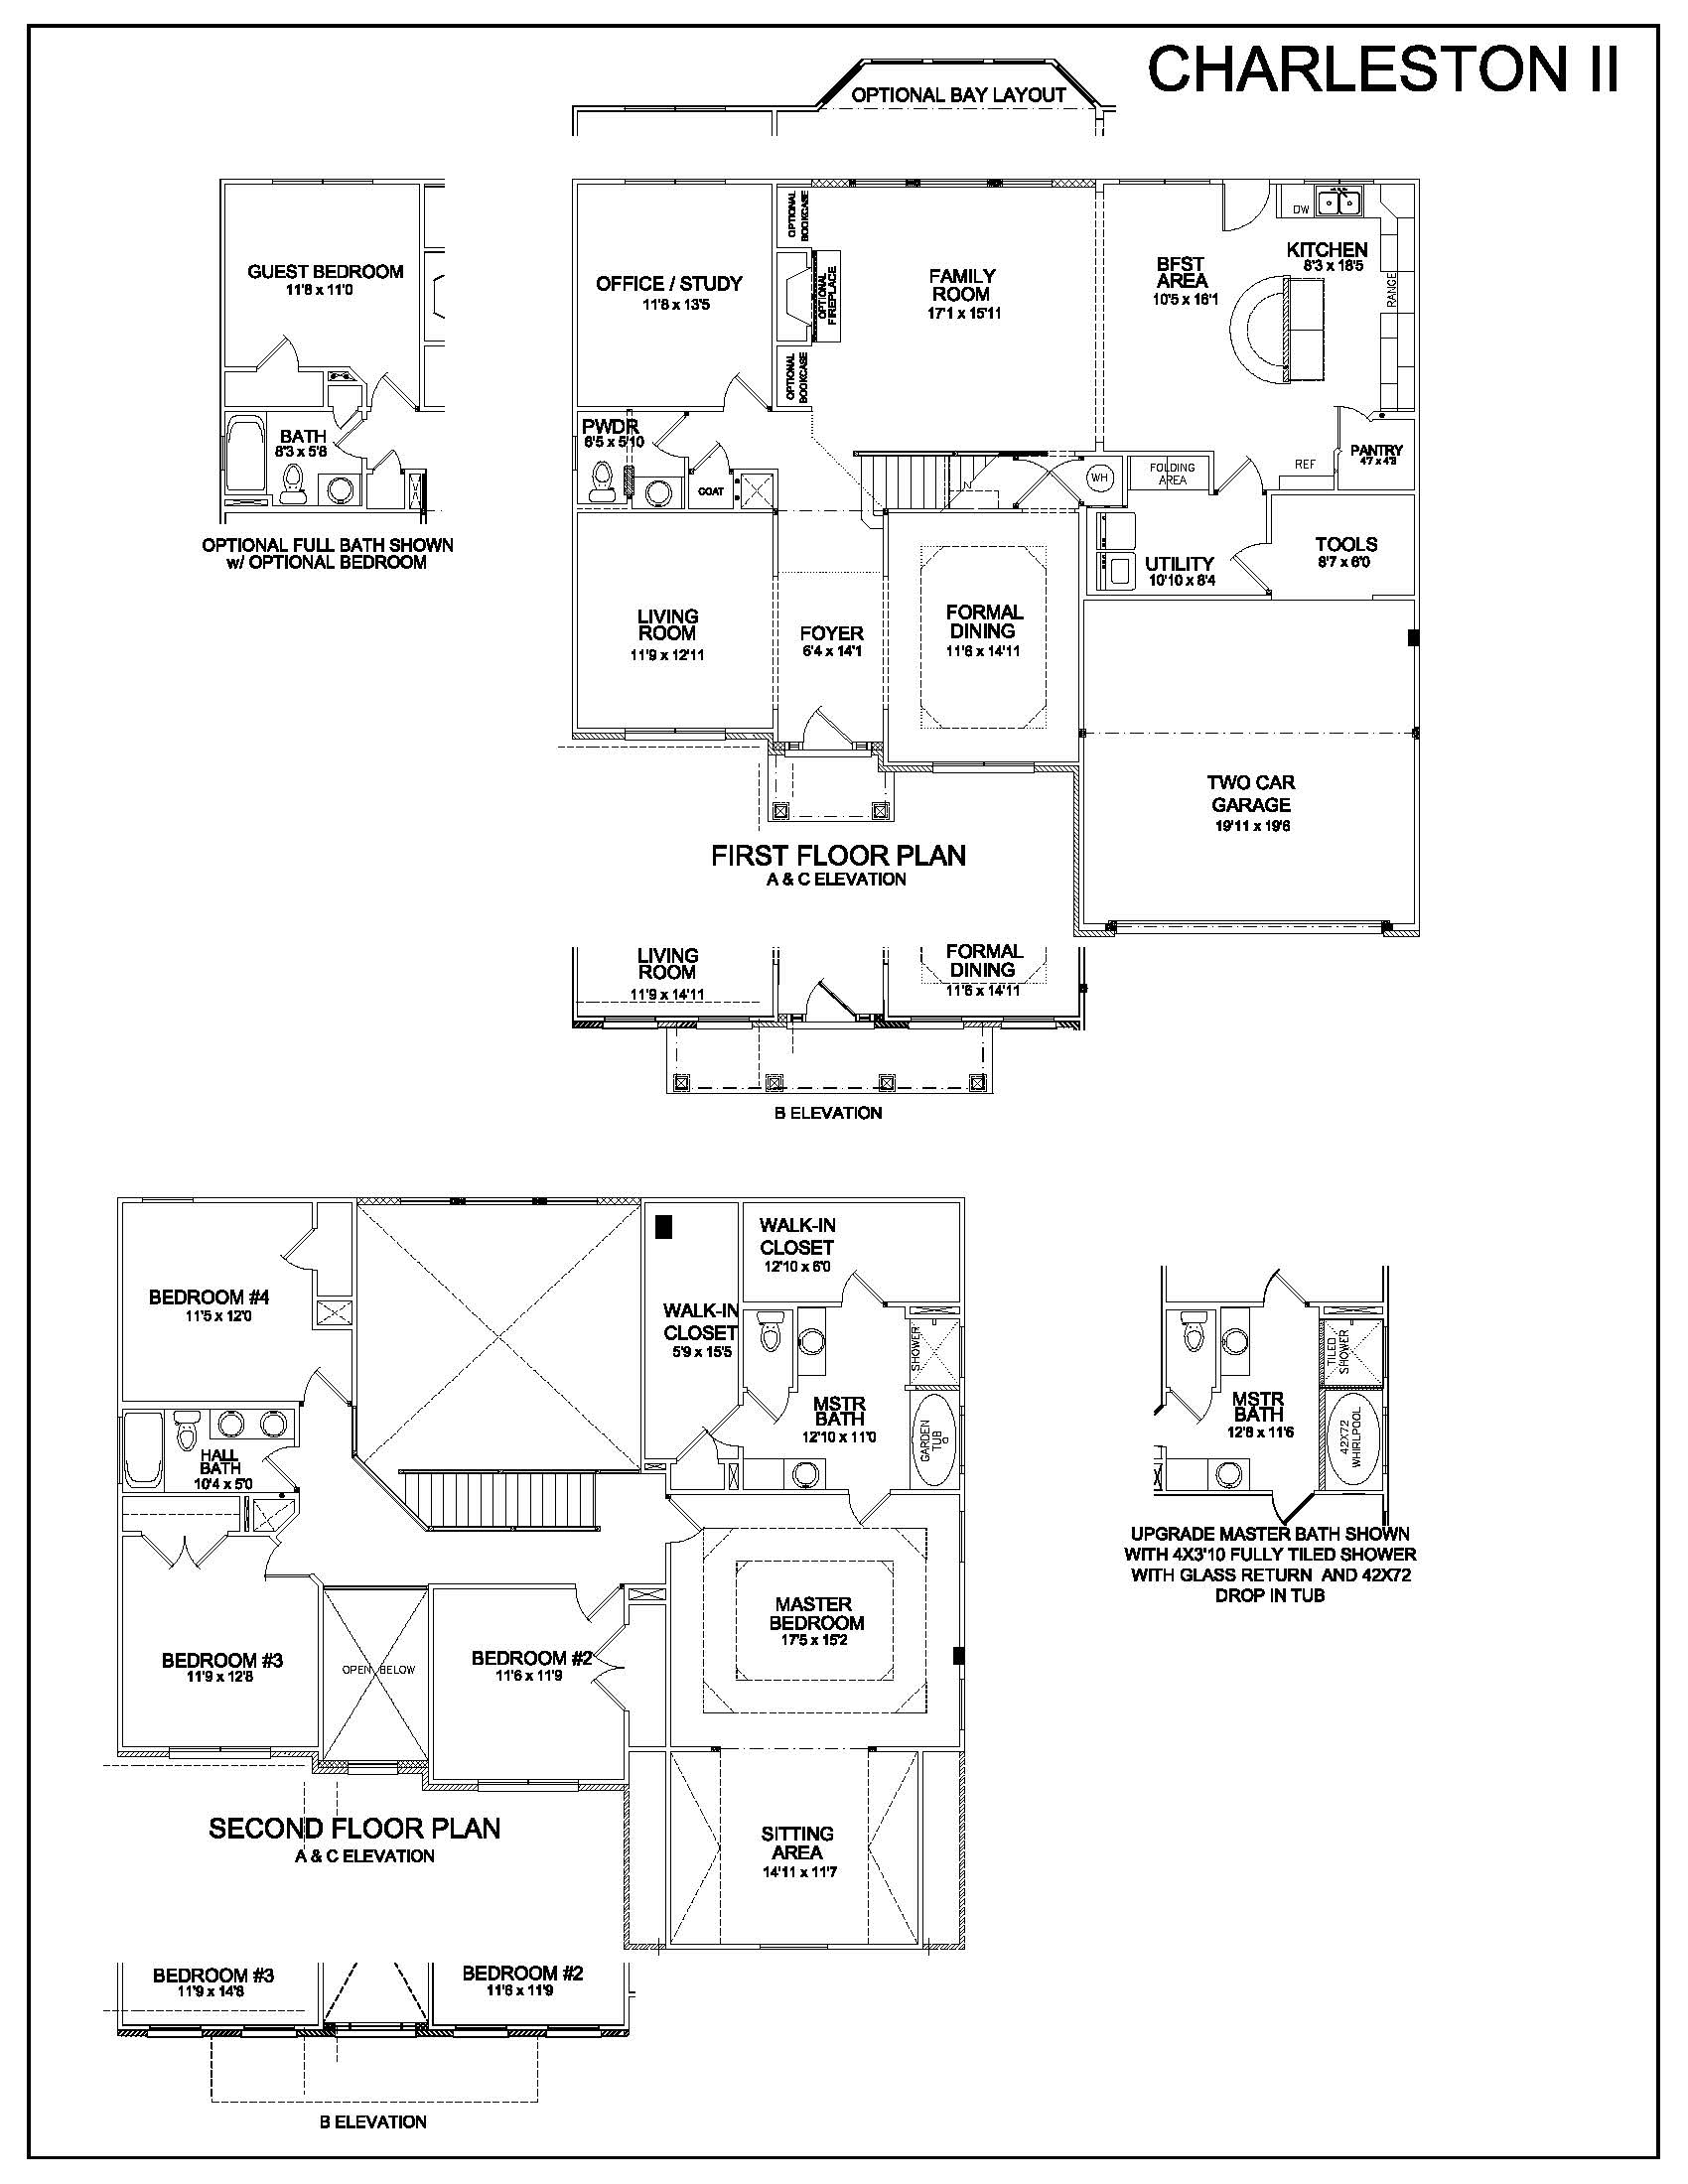 Floor Plans - Charleston II - Louisville Real Estate